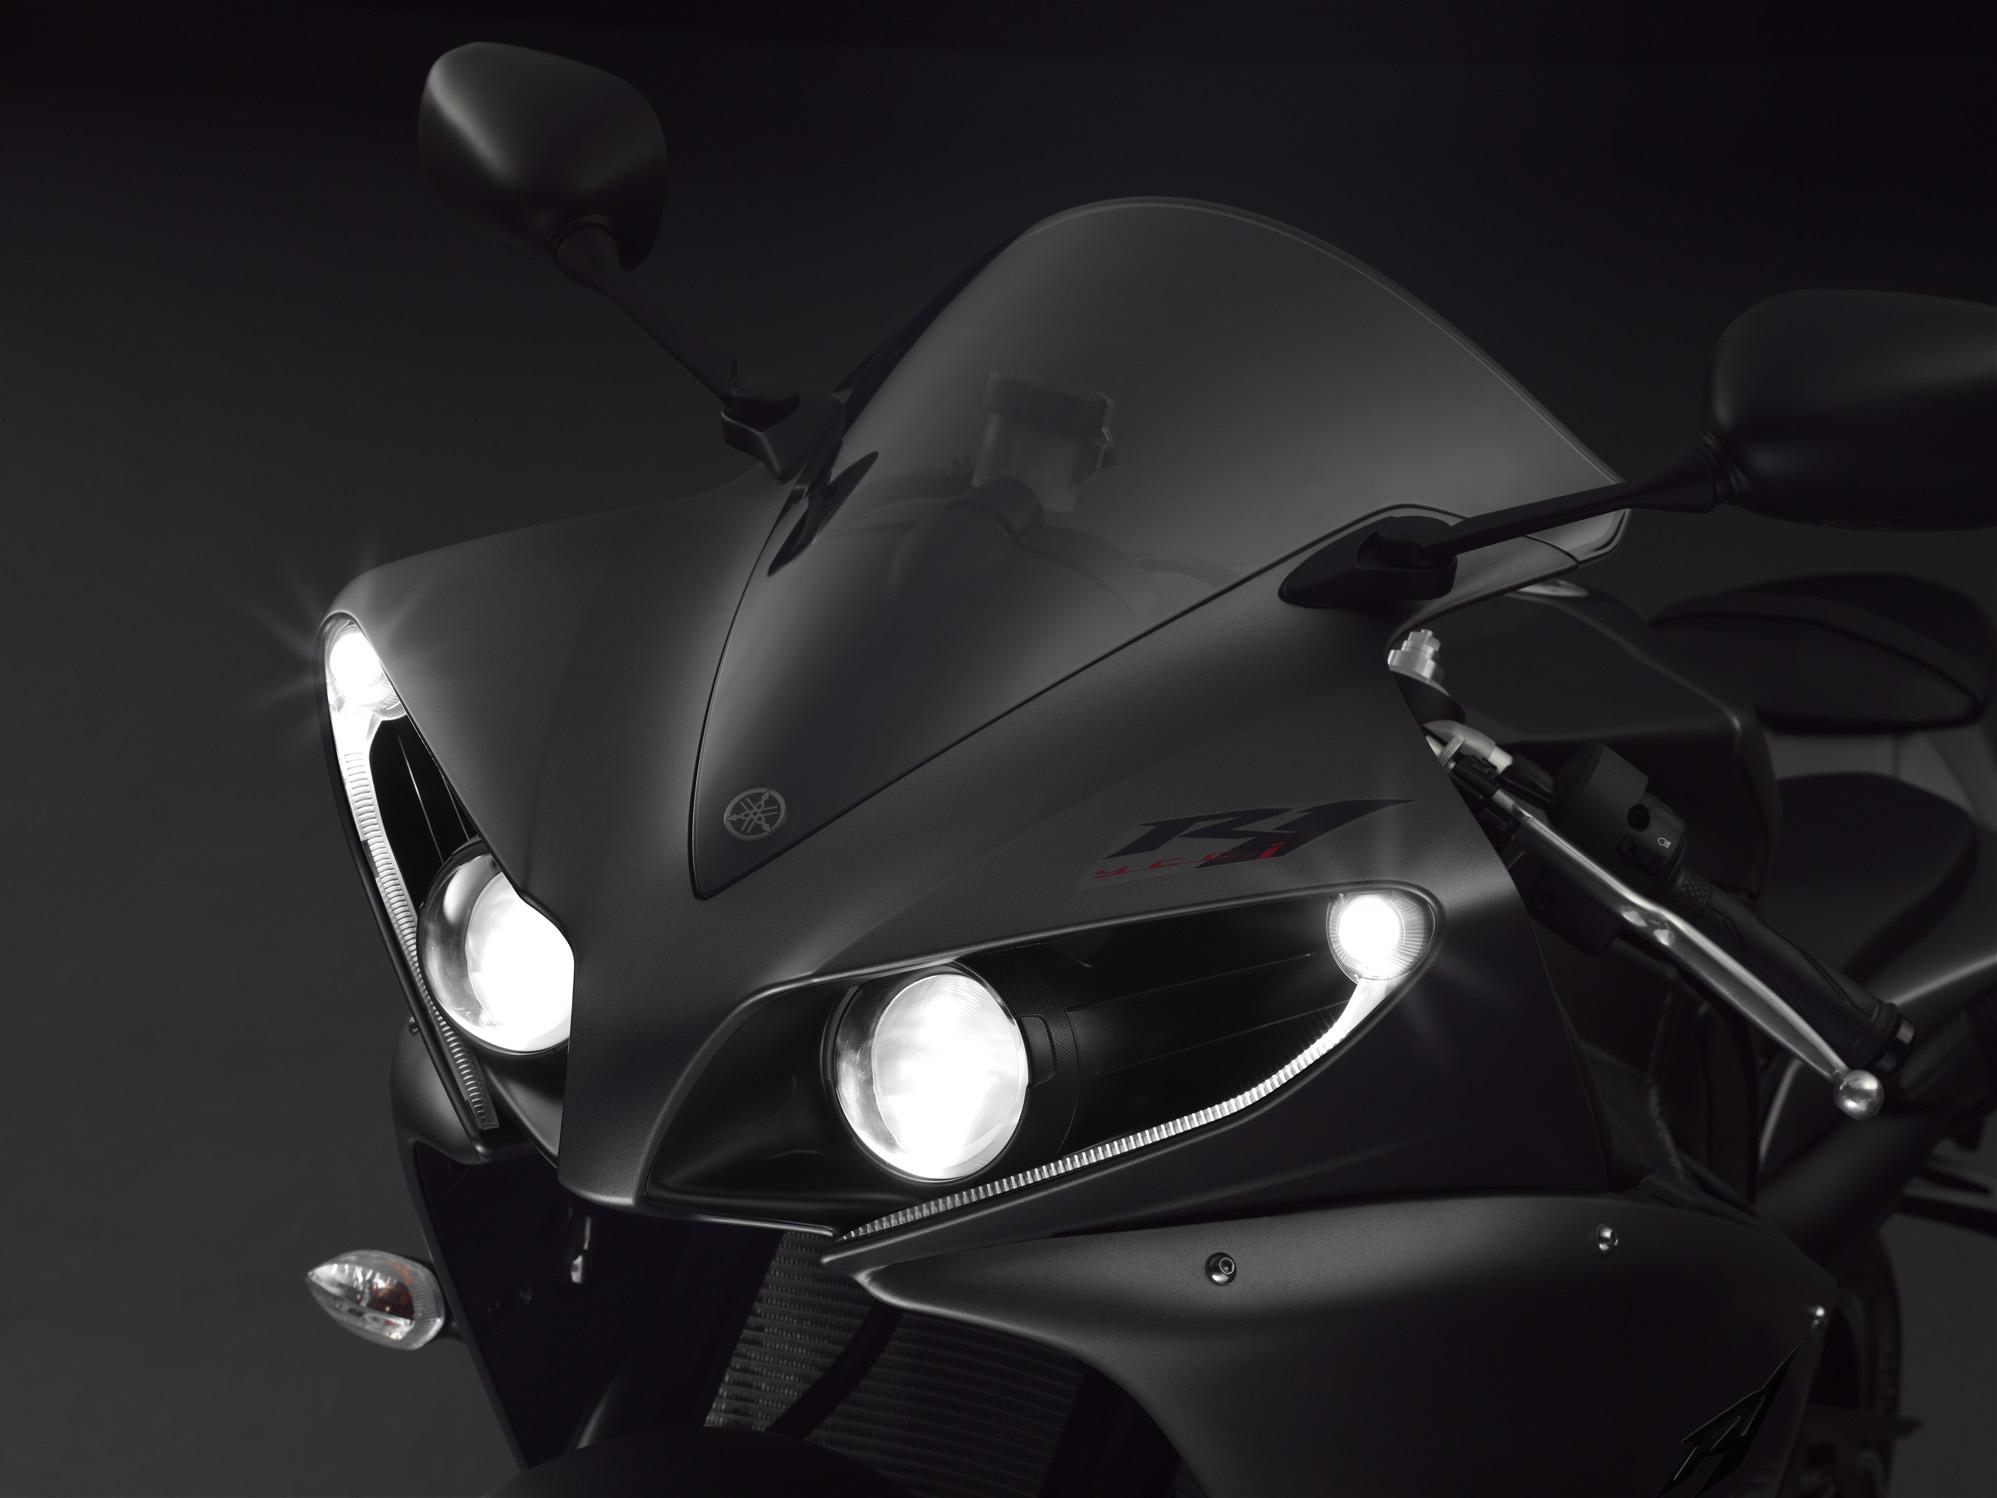 Yamaha YZF-R1 2013 (9)